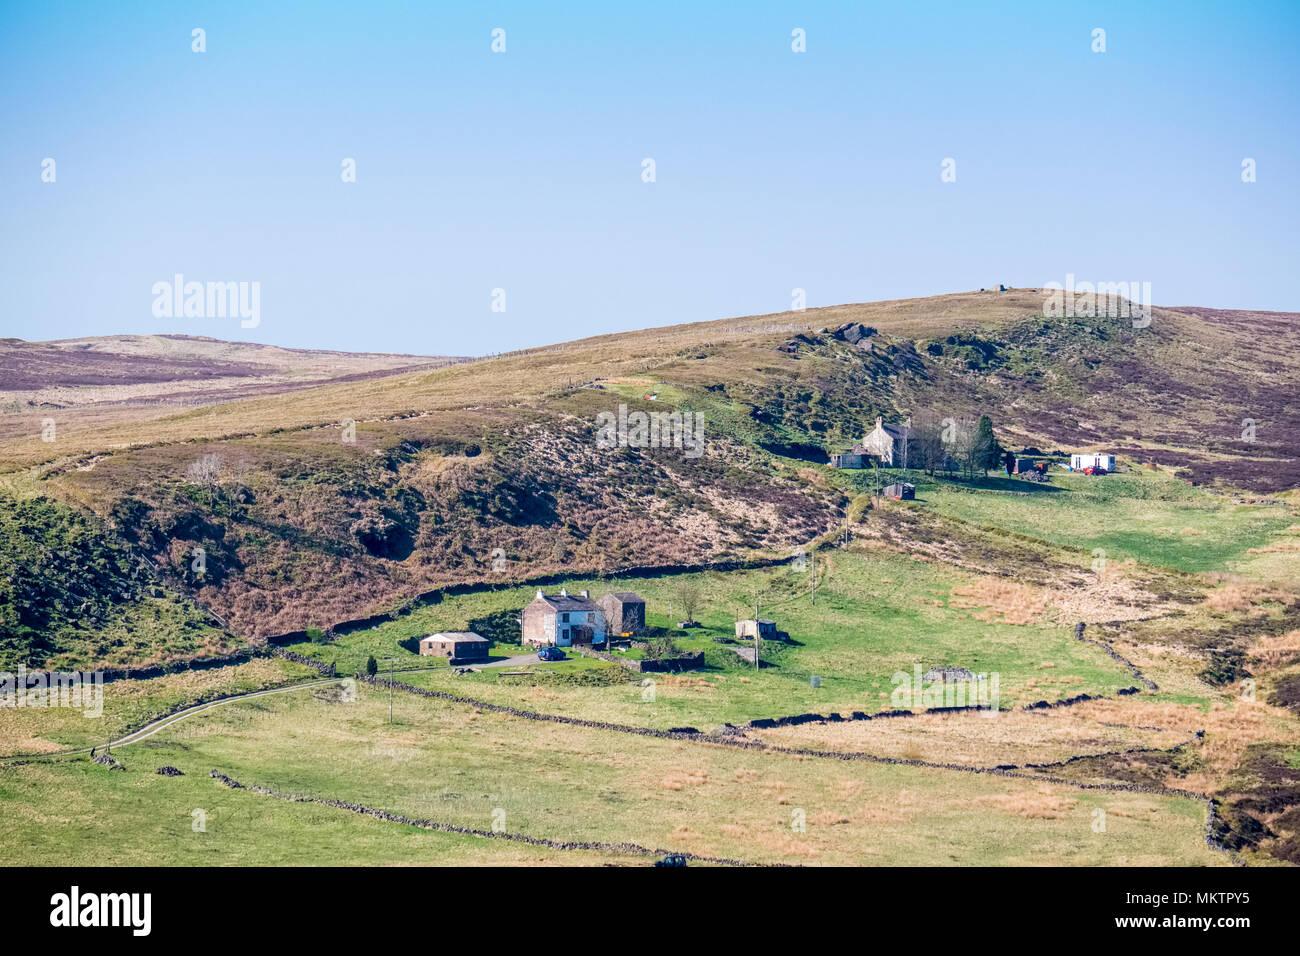 Farmhouses on Drystone Edge near Flash in the Peak District - Stock Image